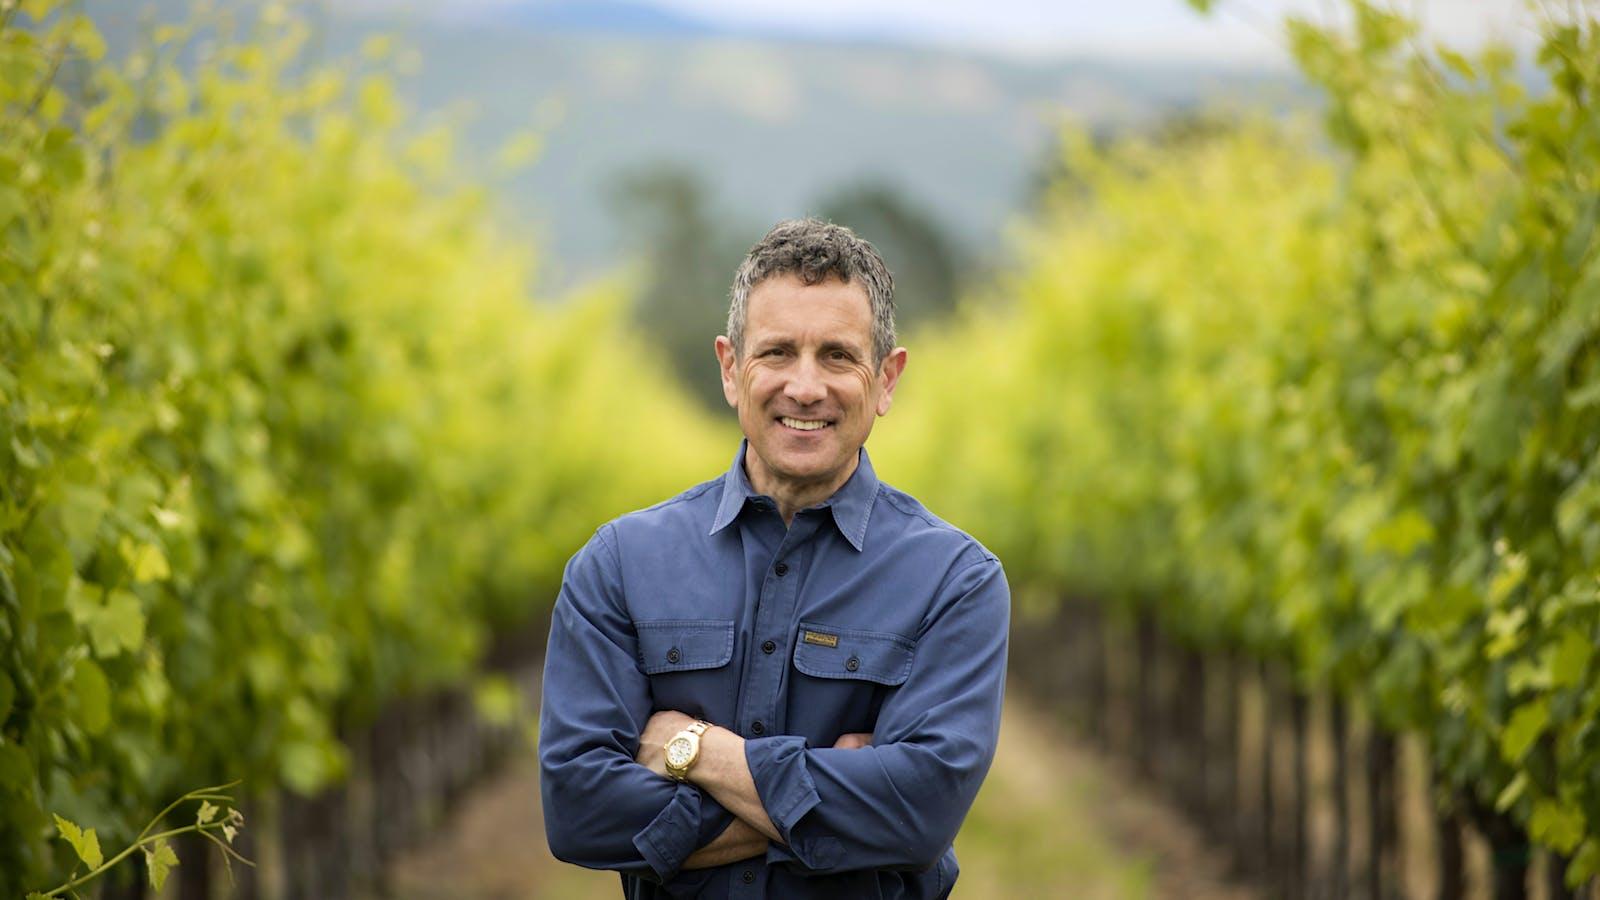 St. Francis Winery President Chris Silva Dies at 52